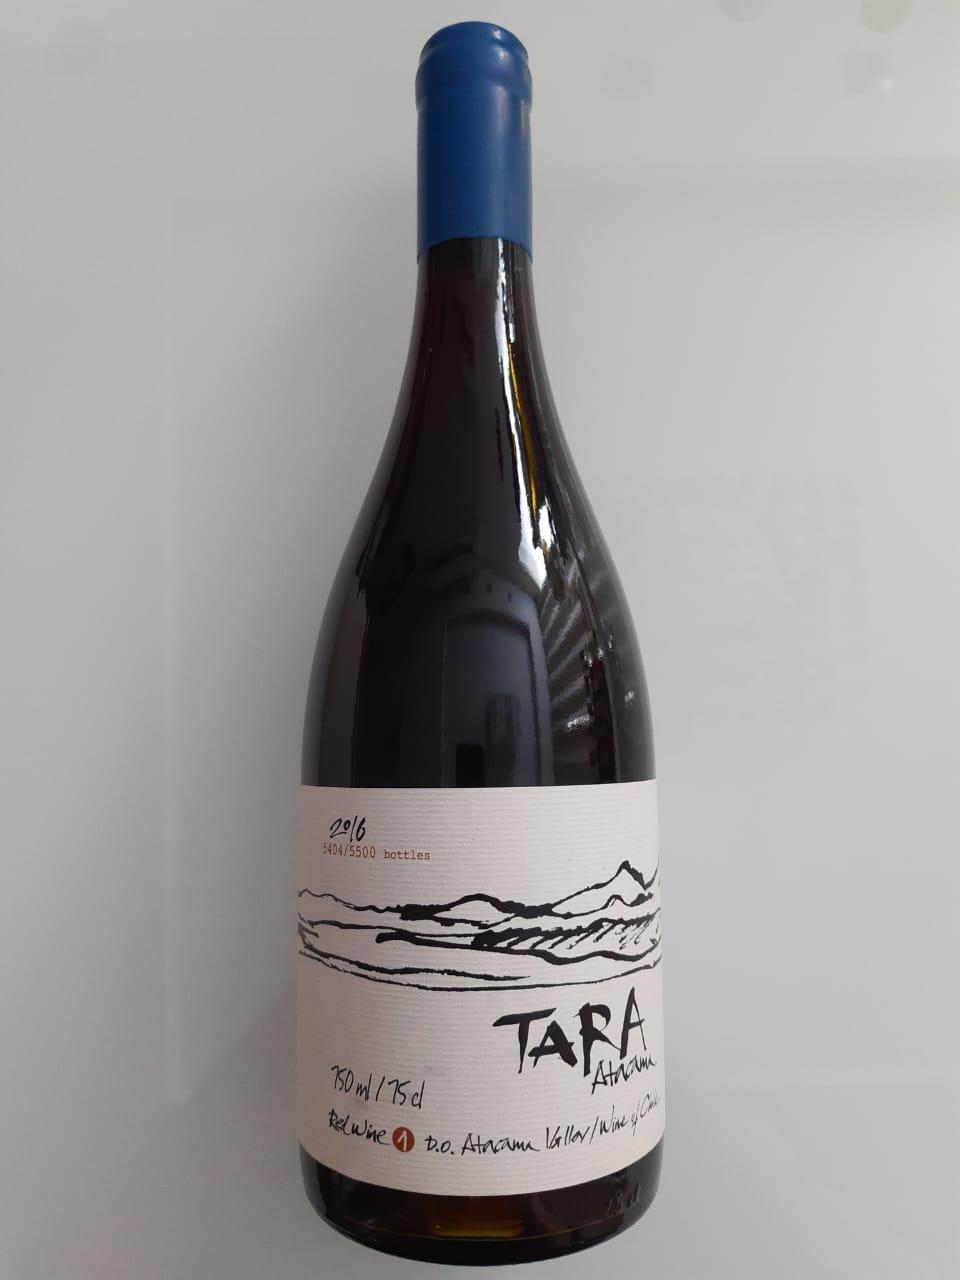 Vinho Tara Atacama Ventisquero Pinot Noir 750ml